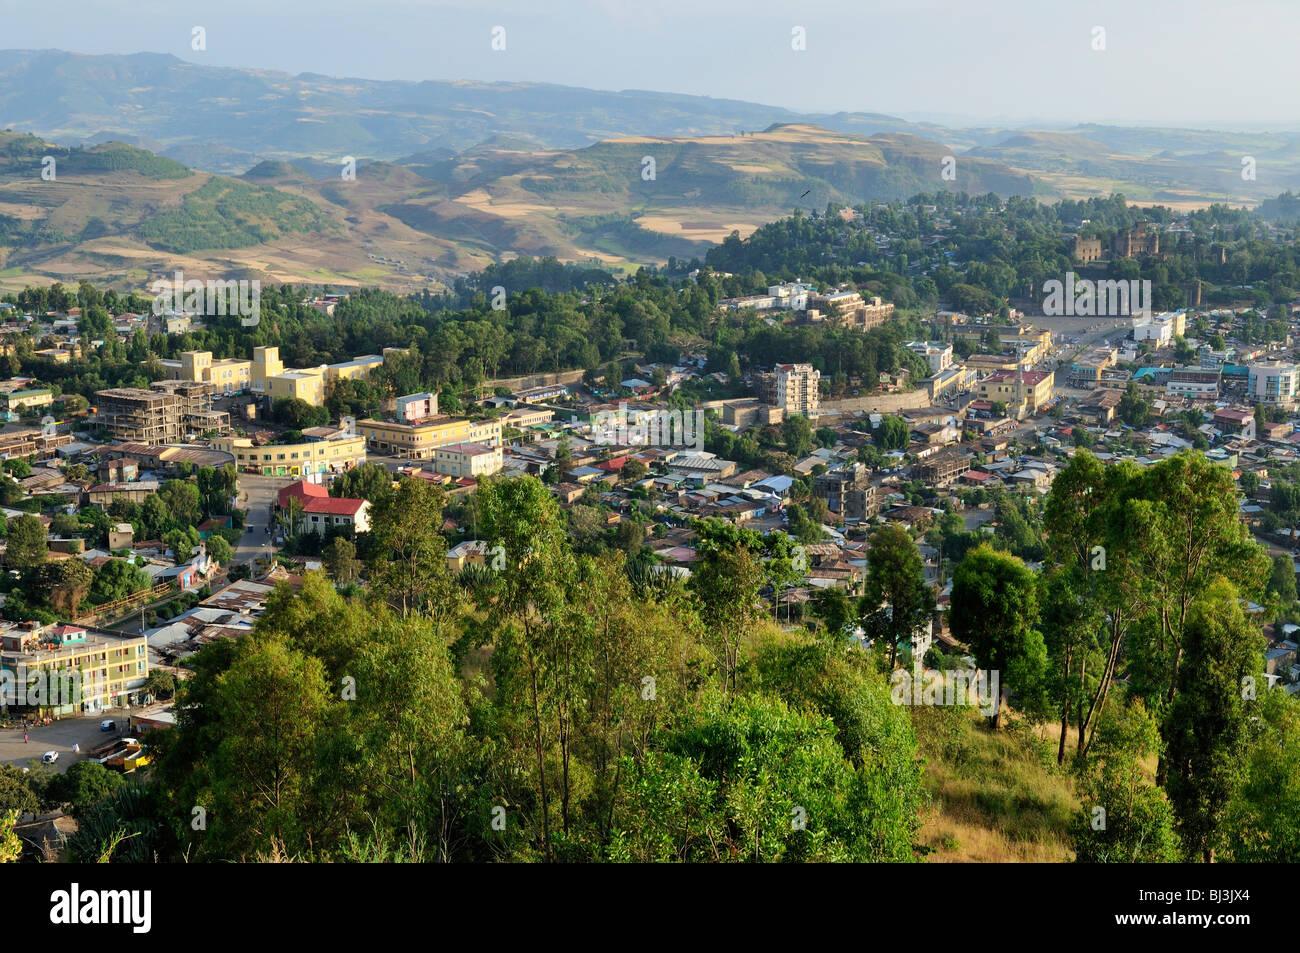 Overlooking Gonder, Gondar, Amhara, Ethiopia, Africa - Stock Image